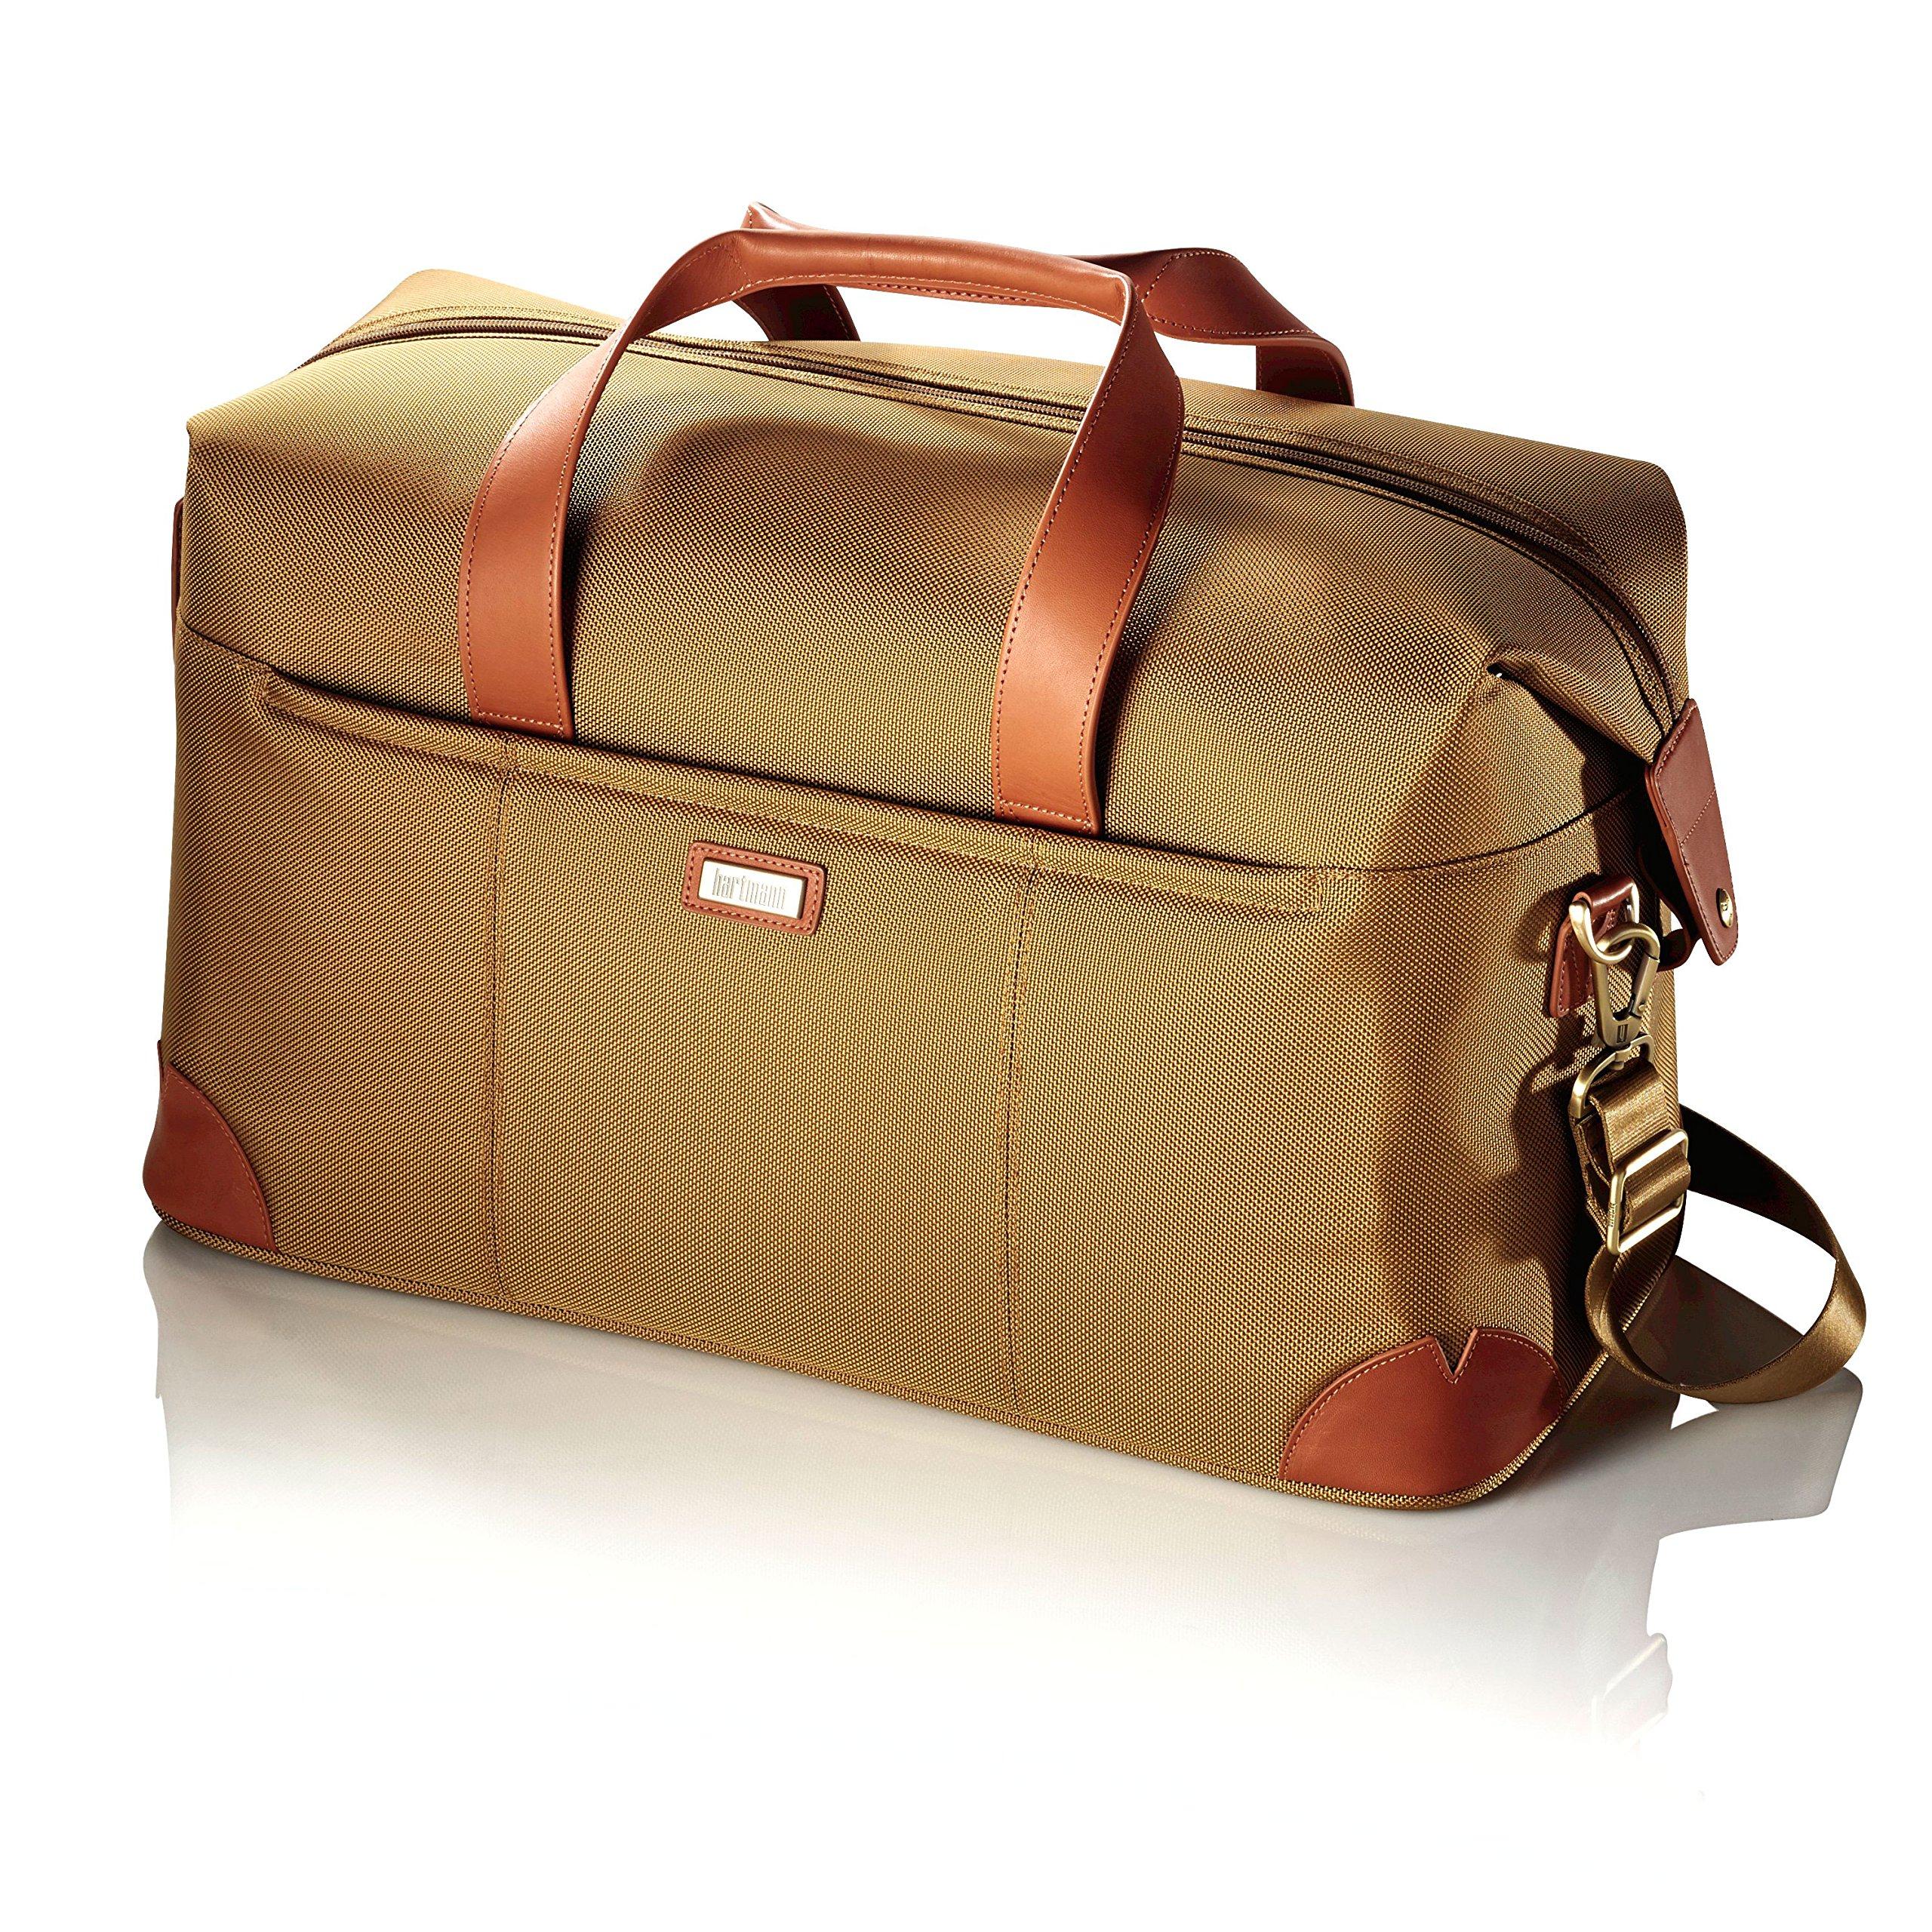 Hartmann Ratio Classic Deluxe Weekend Nylon Duffel Bag in Safari